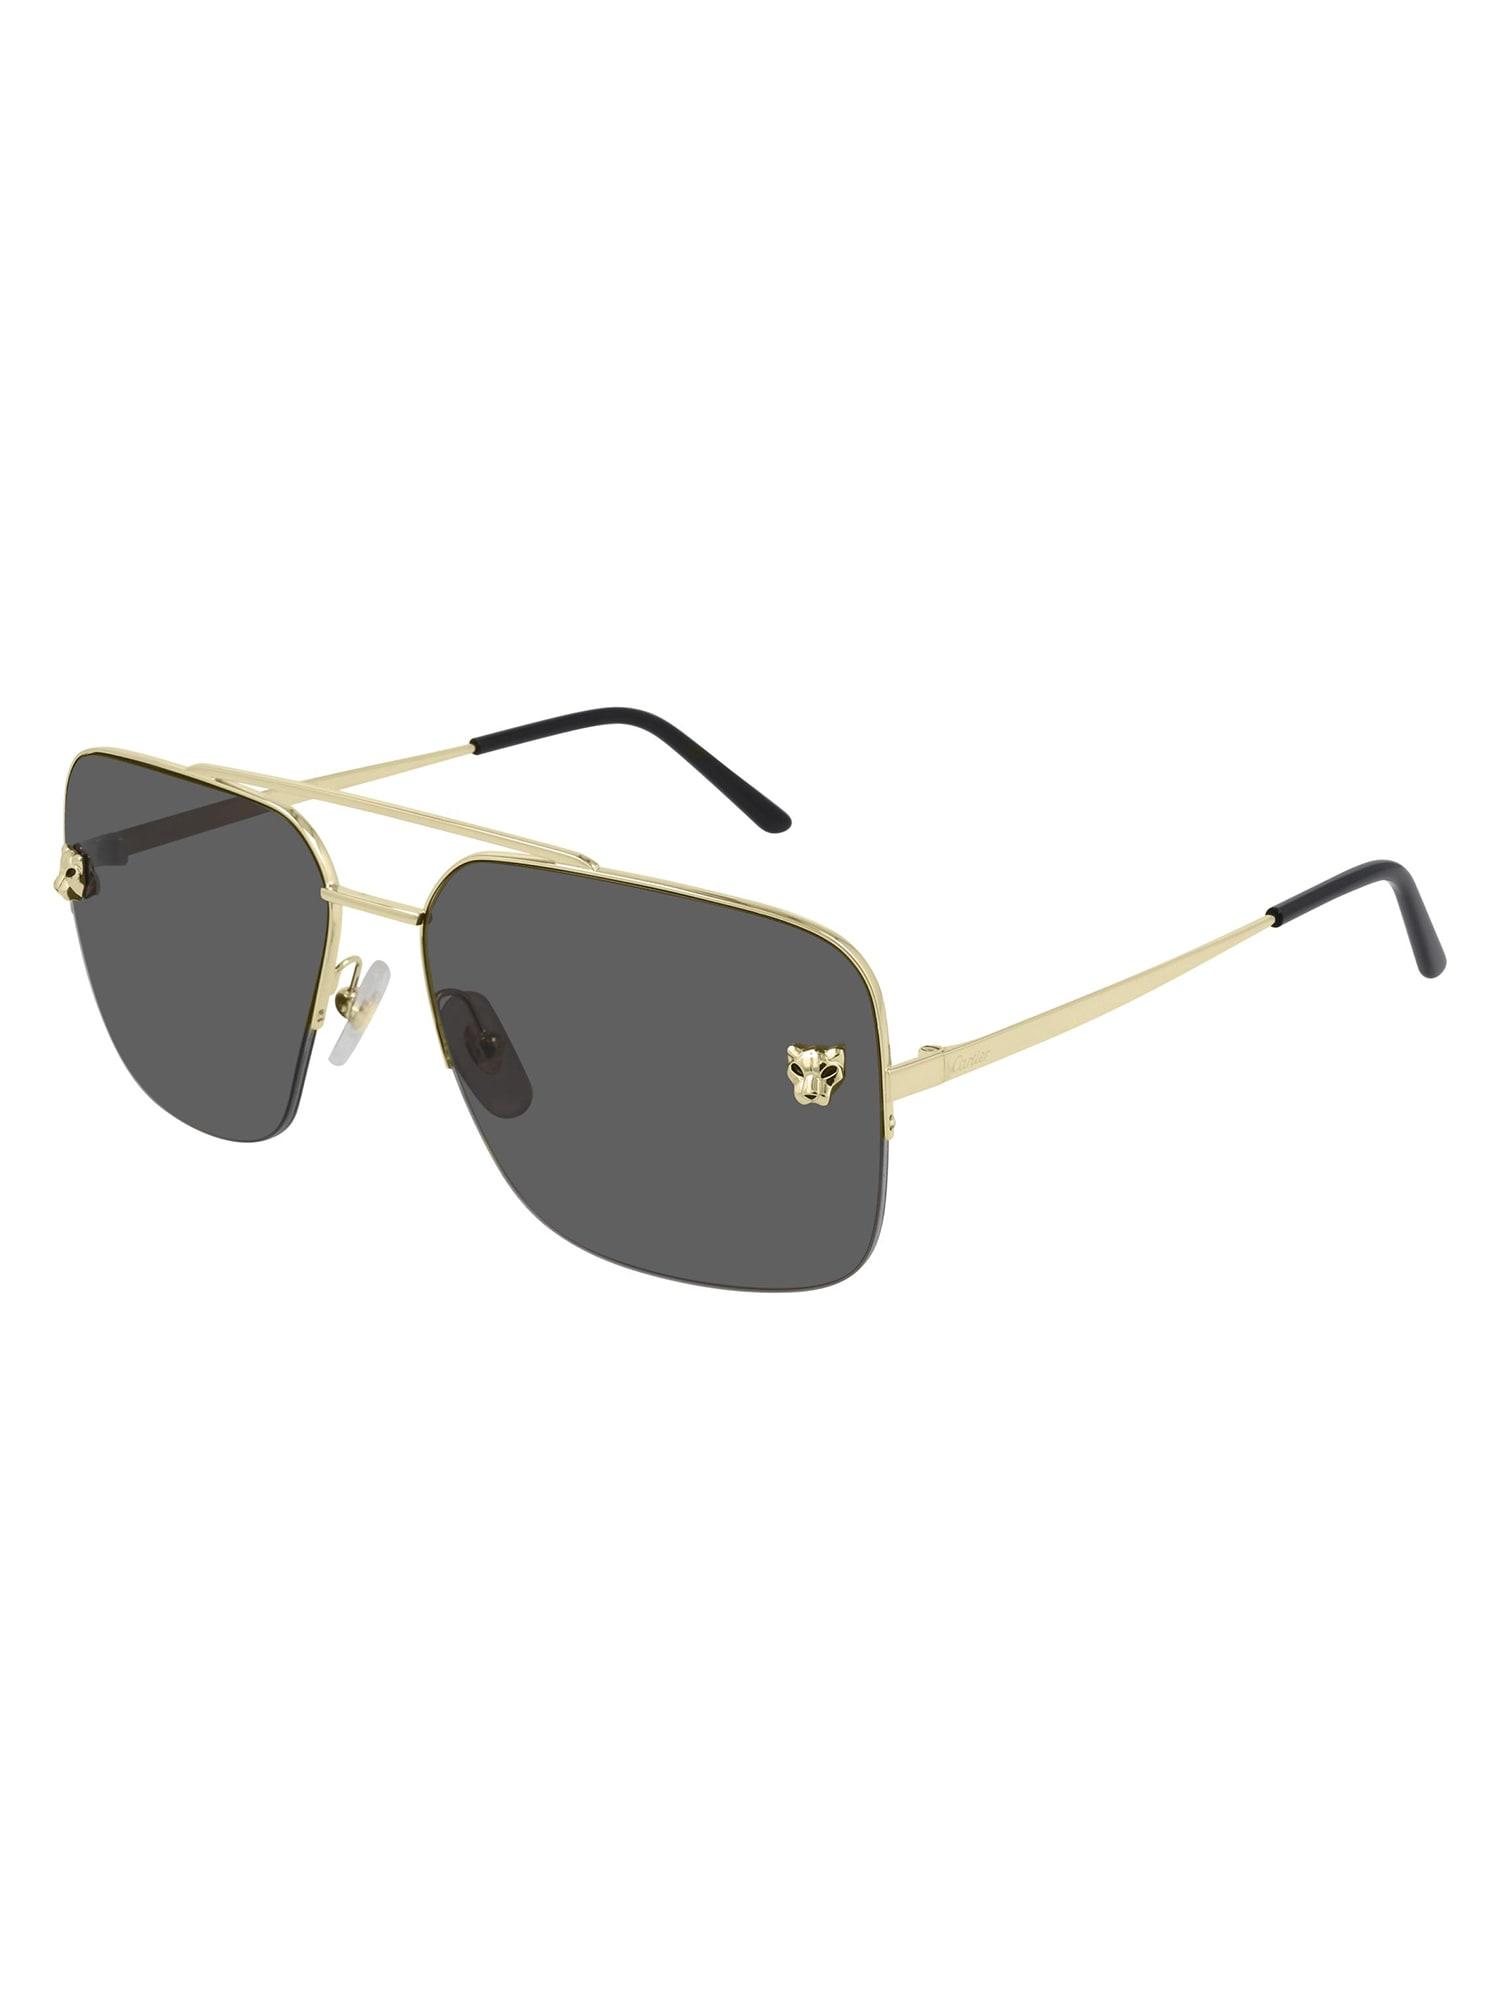 Cartier Eyewear CT0244S Sunglasses